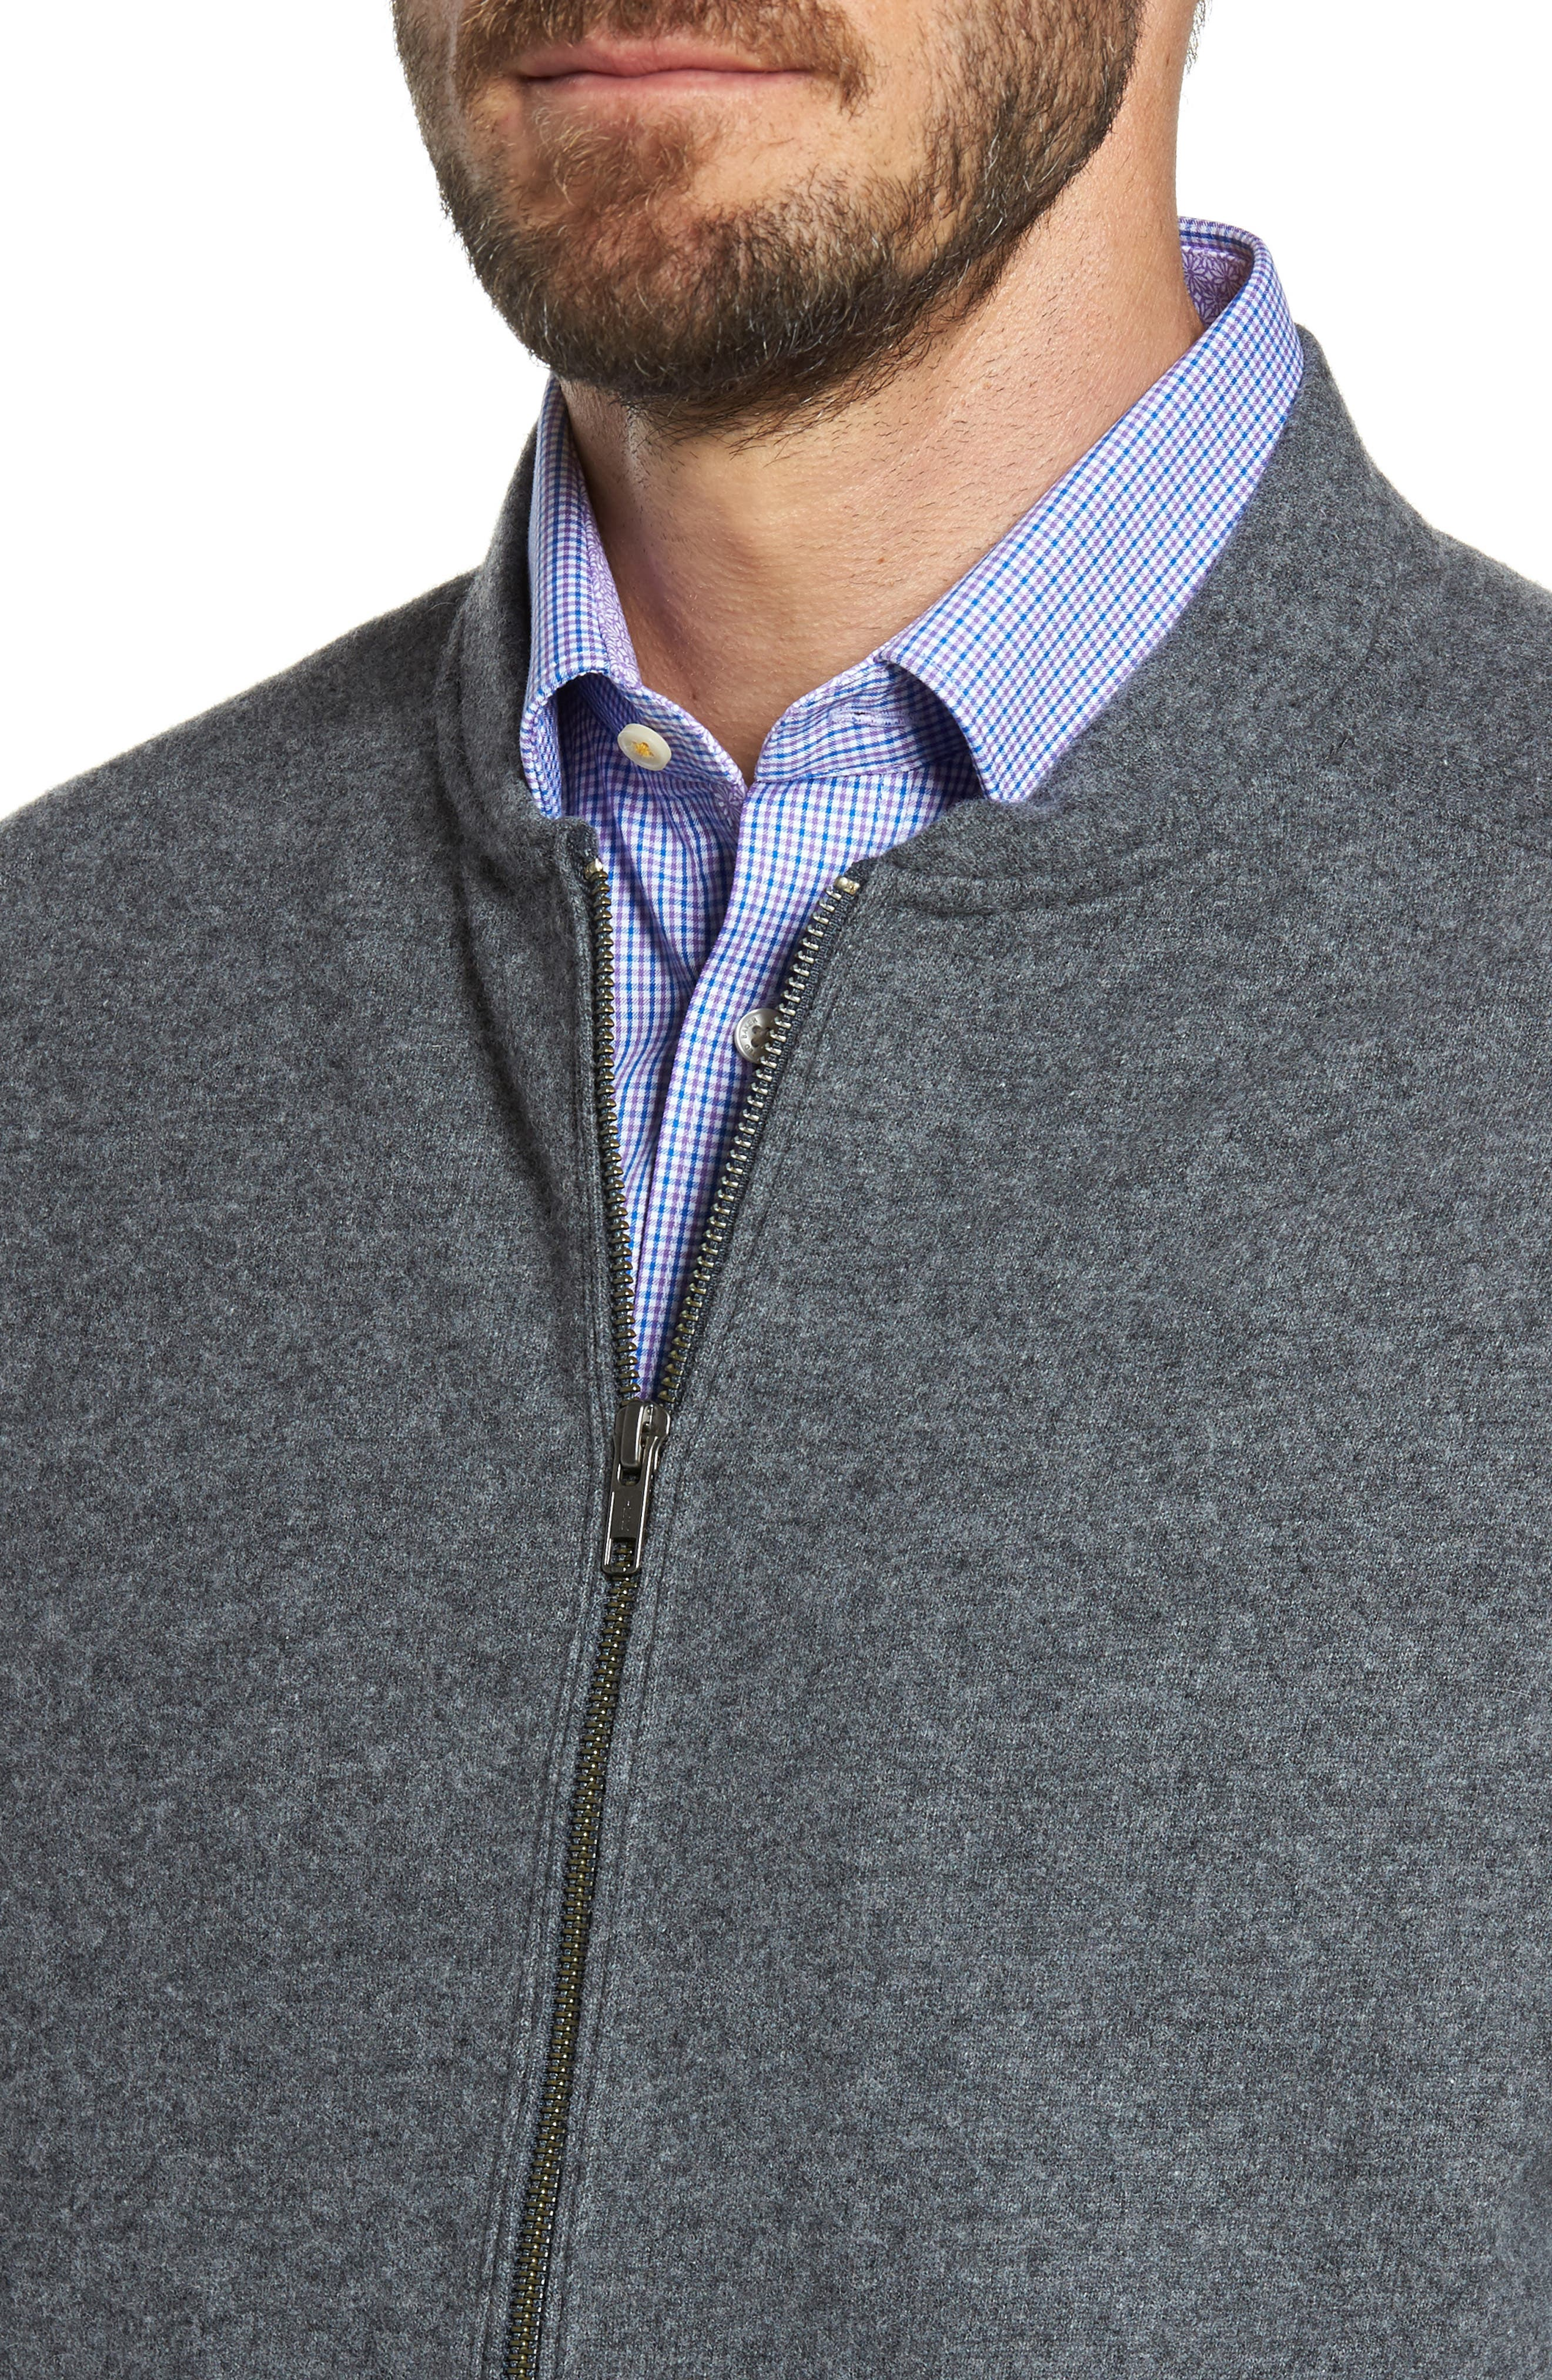 Wool Blend Fleece Bomber Jacket,                             Alternate thumbnail 4, color,                             Grey Charcoal